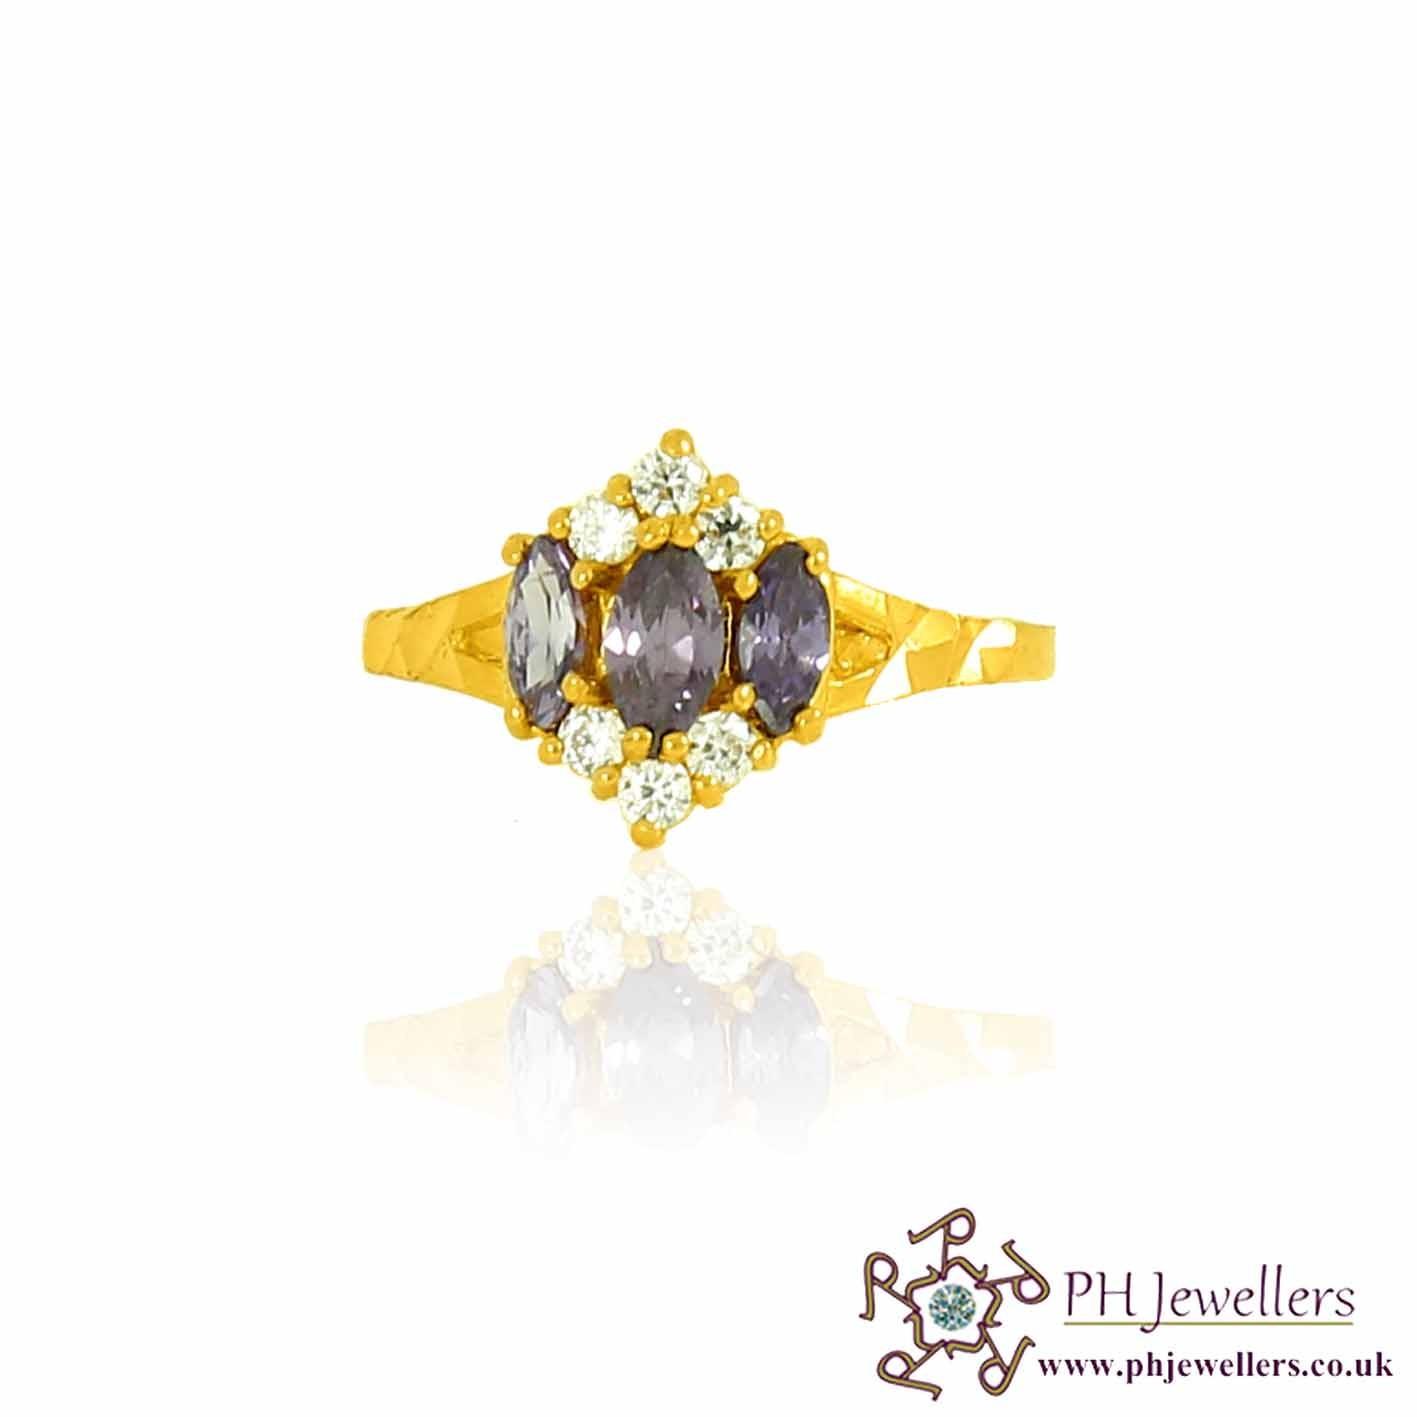 22ct 916 Hallmark Yellow Gold Amythayest Size M,N Ring CZ SR97